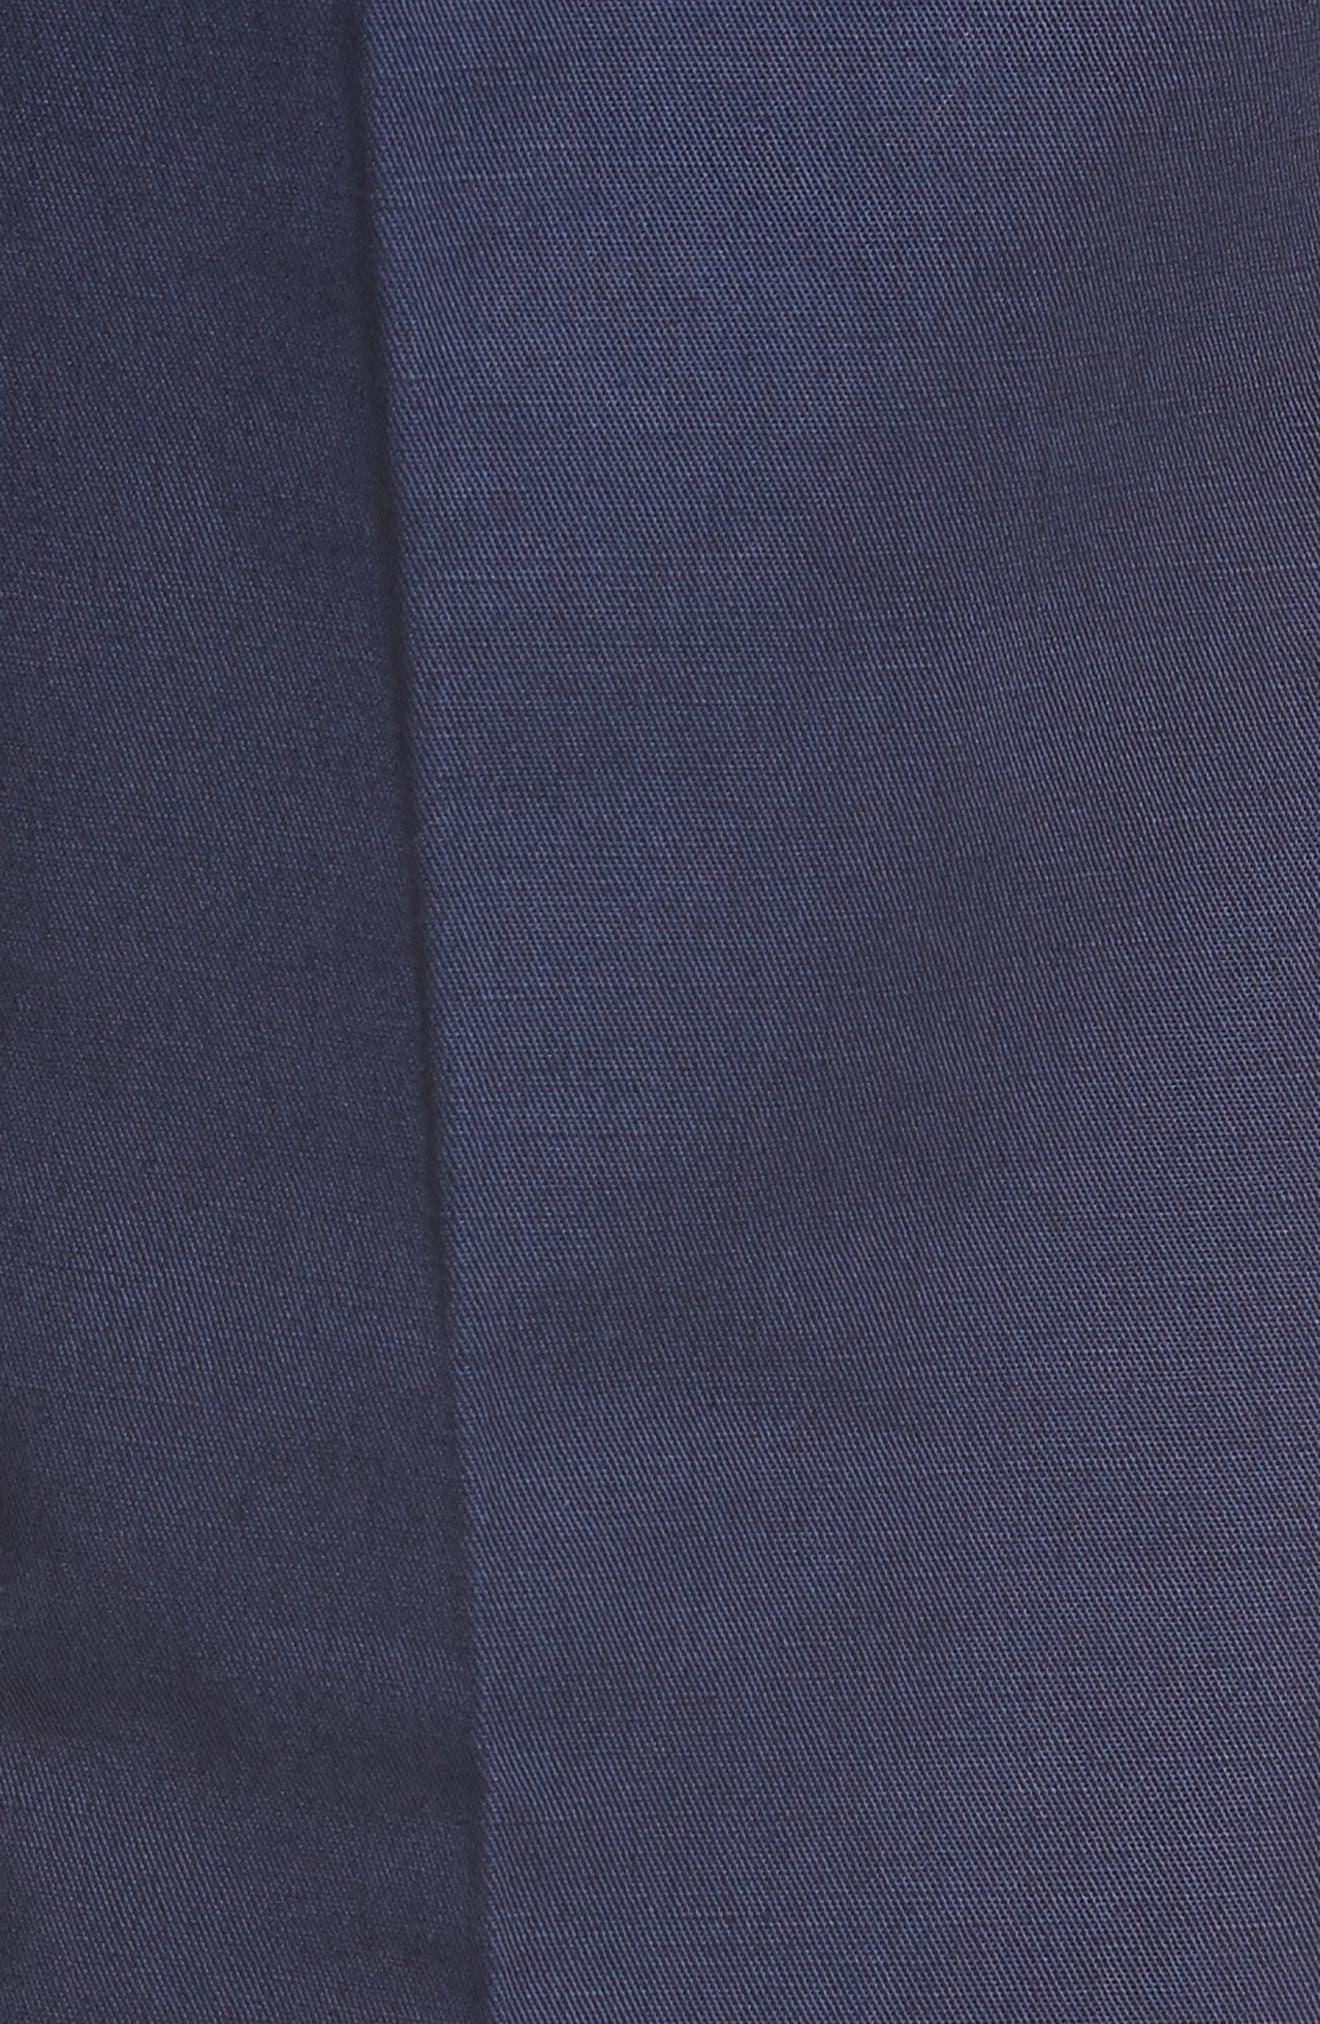 Flat Front Solid Cotton & Linen Trousers,                             Alternate thumbnail 8, color,